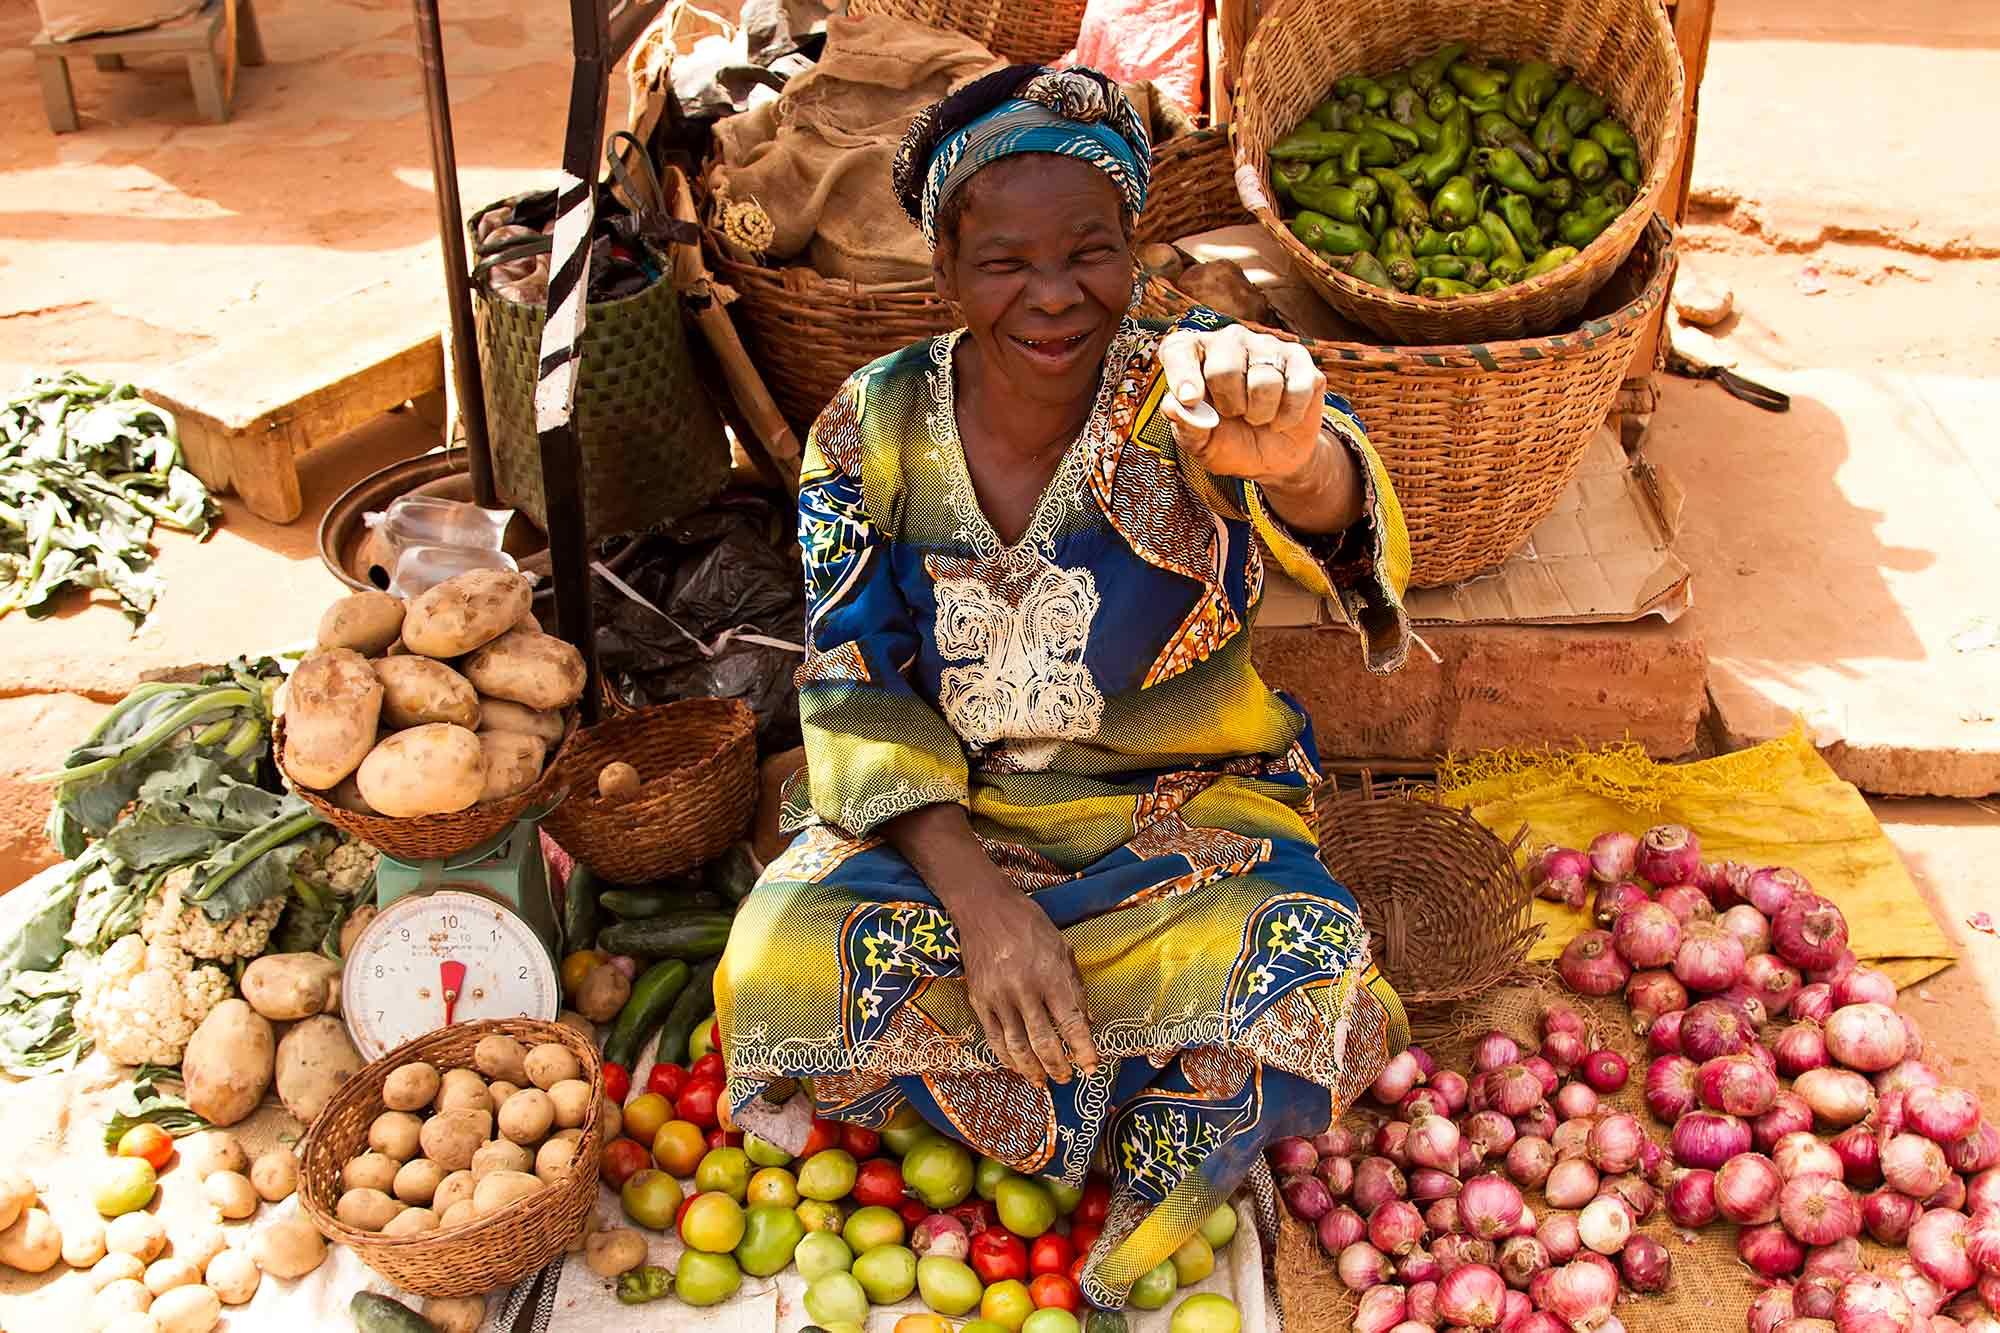 Market woman in Ouagadougou, Burkina Faso. © Ulli Maier & Nisa Maier